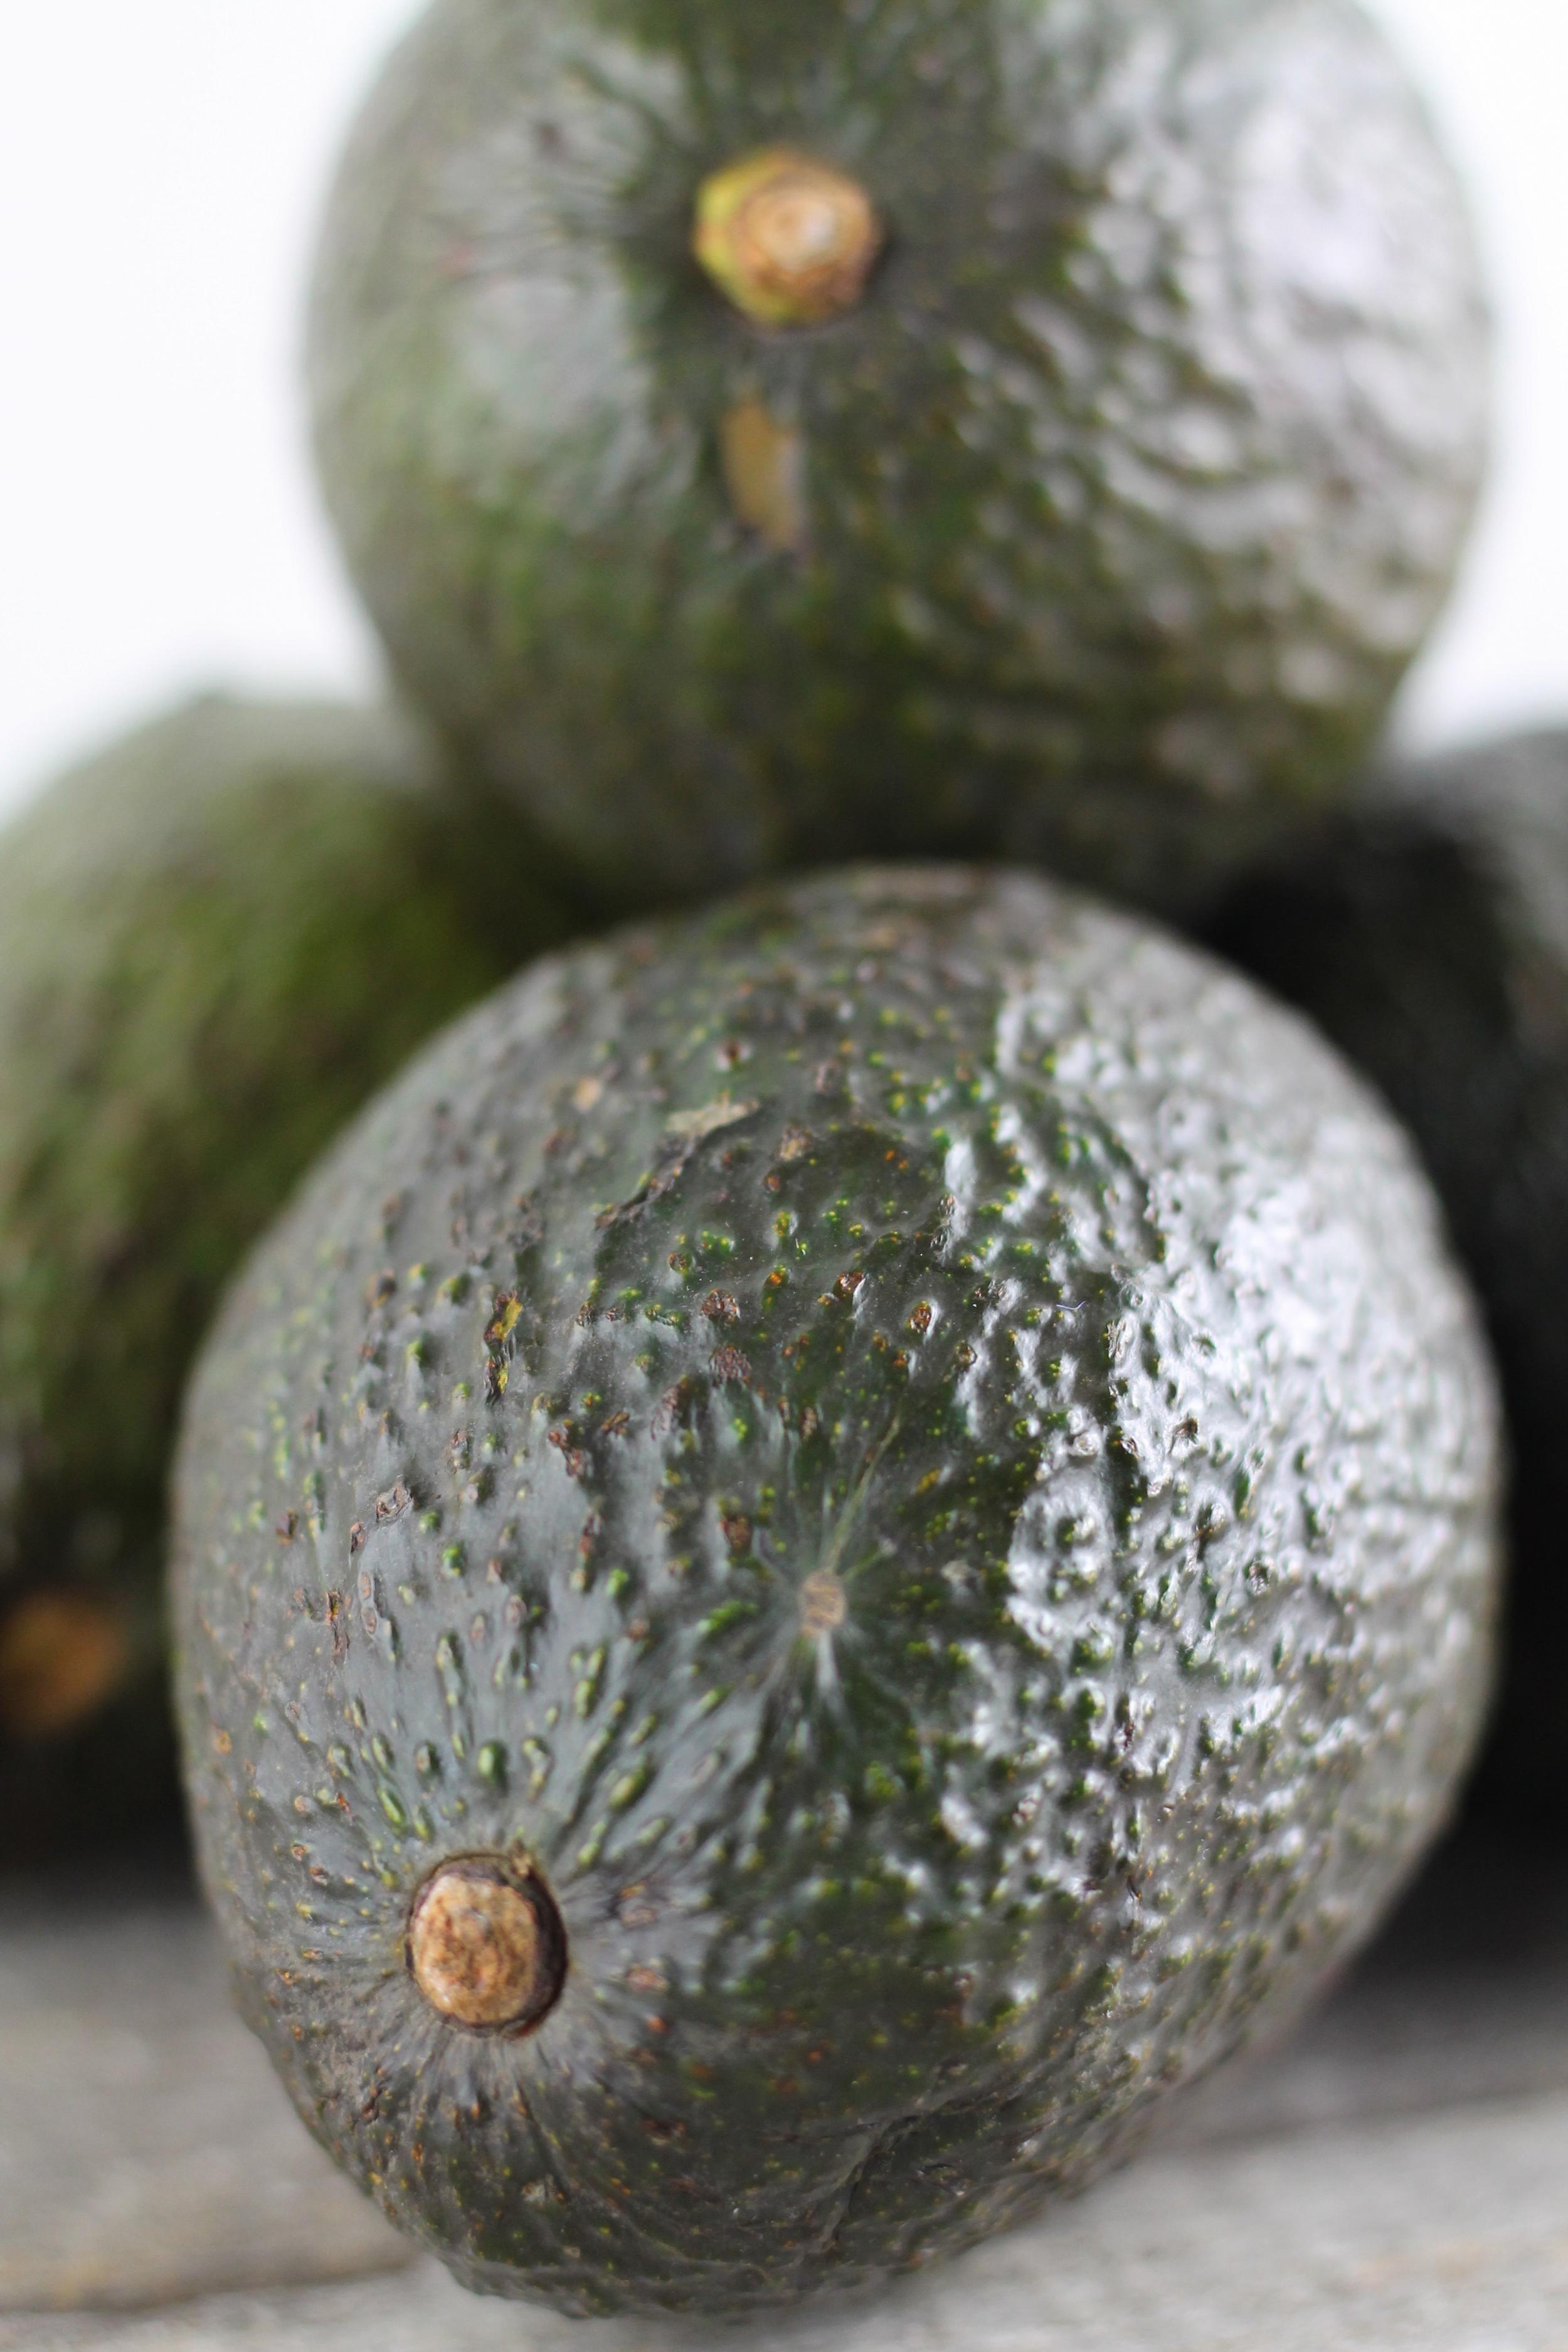 Avocados are healthy, holiday snacks